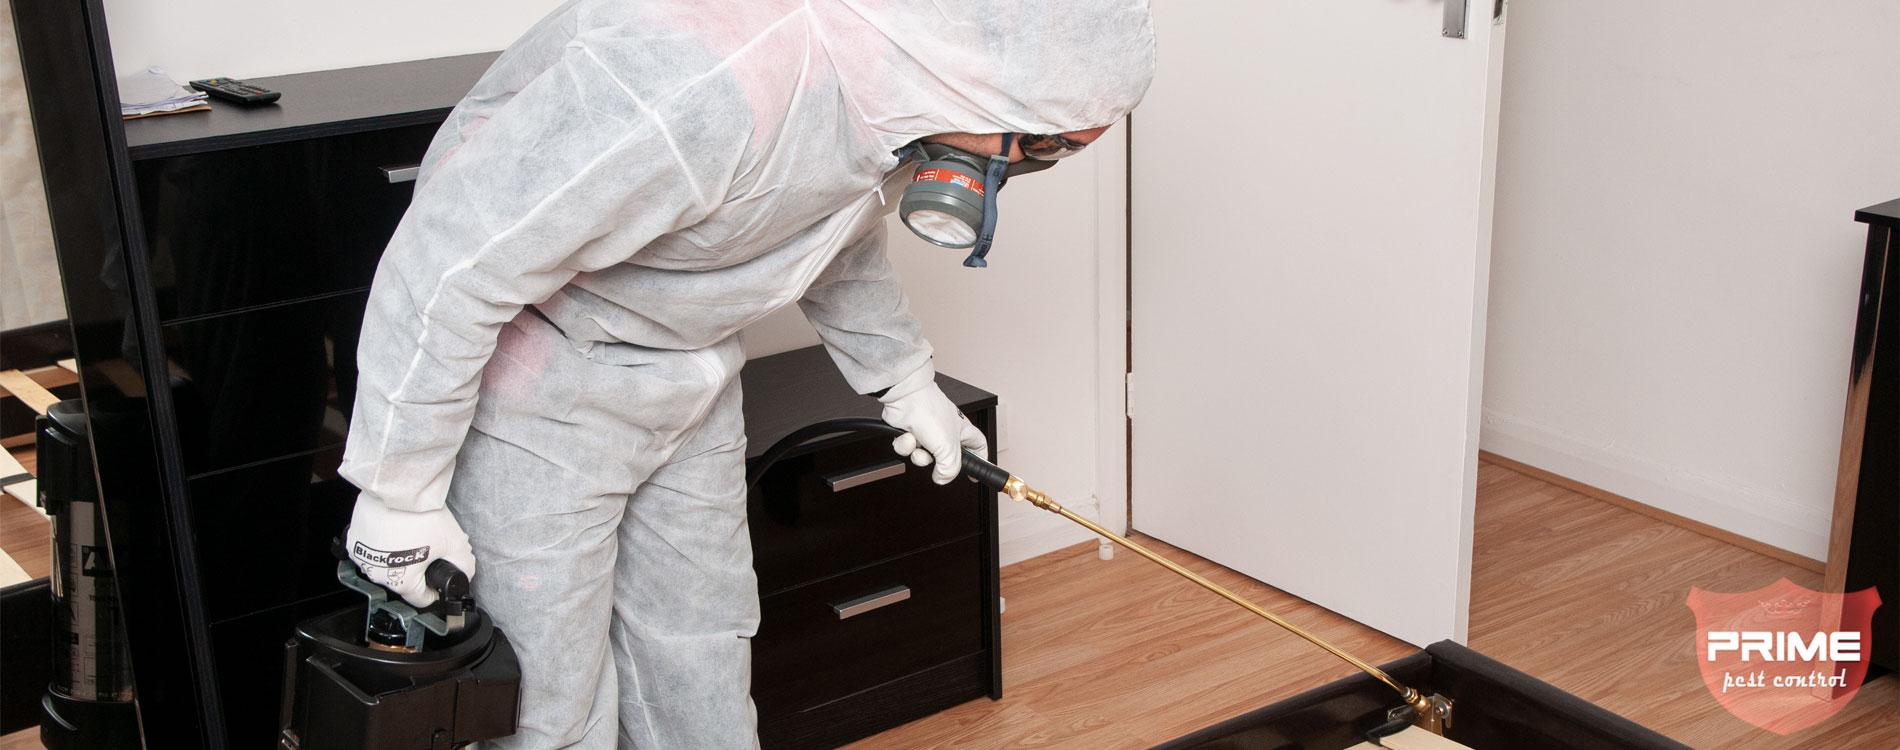 residential-pest-control-treatment-London